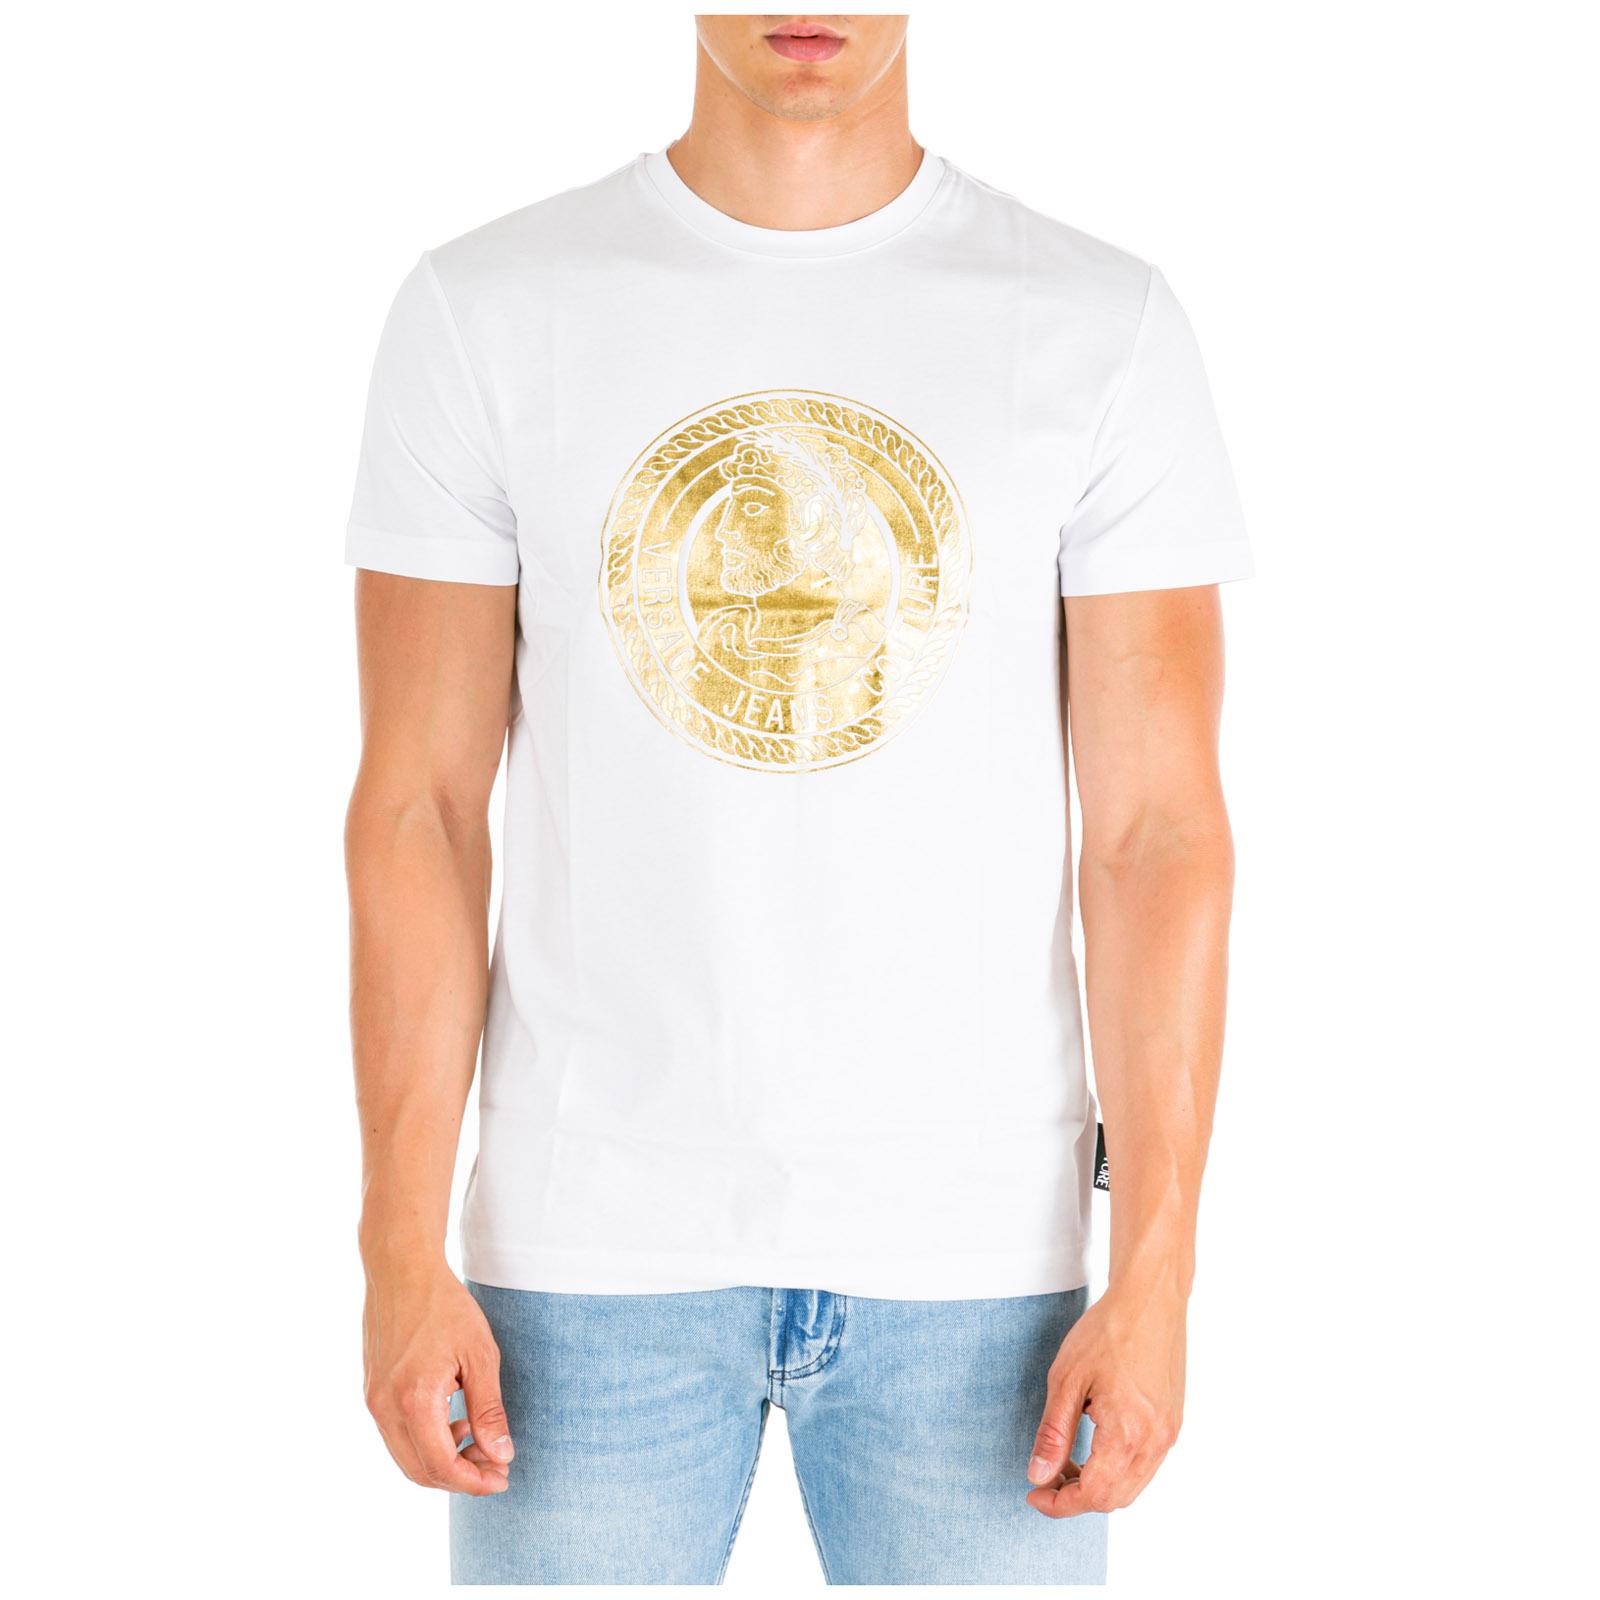 84120a06 Men's short sleeve t-shirt crew neckline jumper slim fit